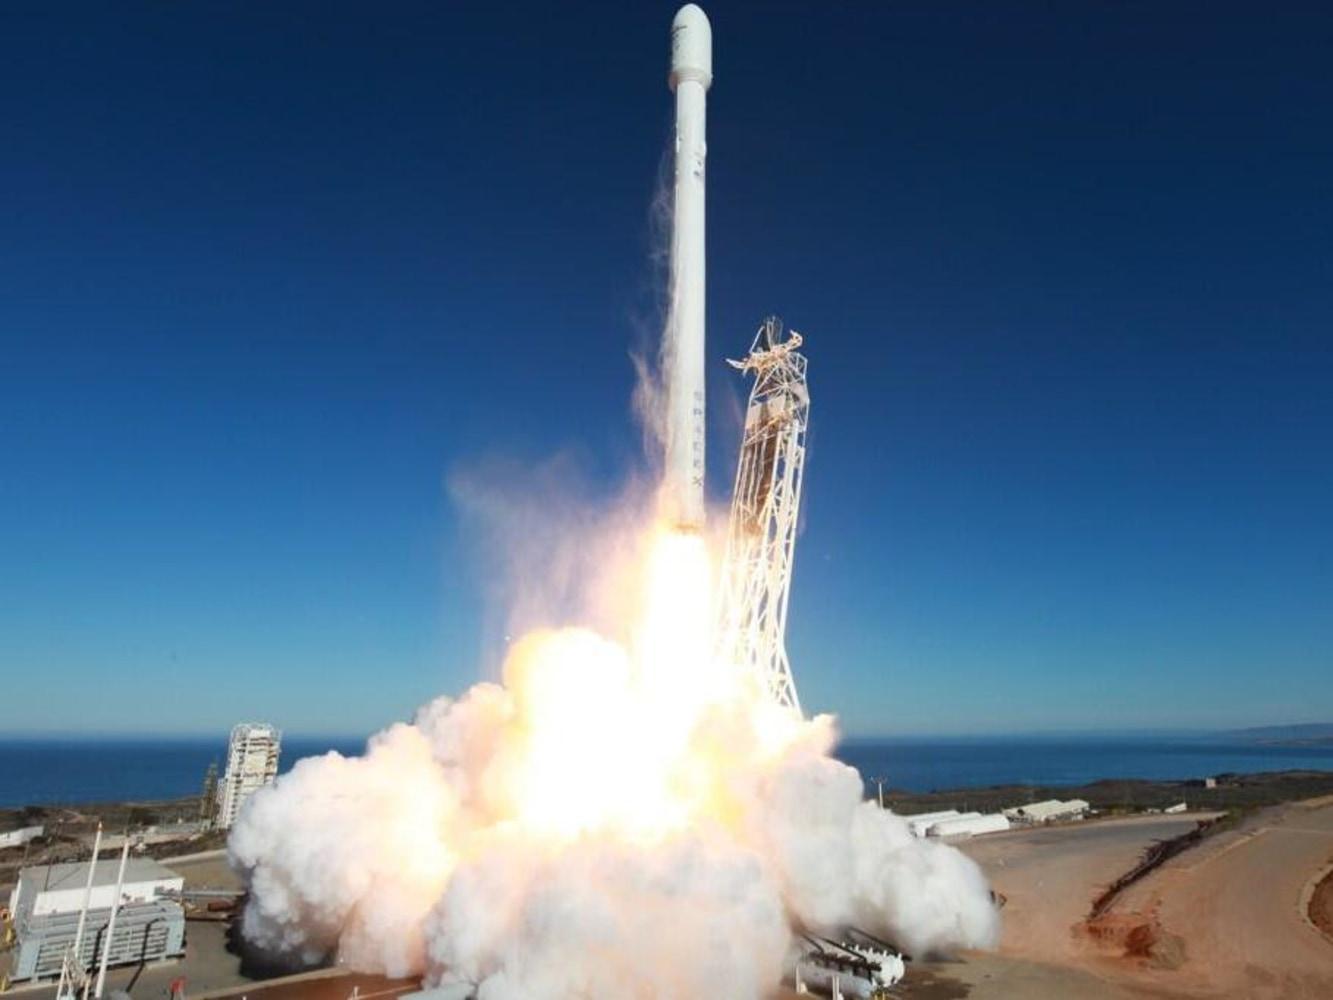 spacex falcon v1.1 vandenberg arrives - photo #42